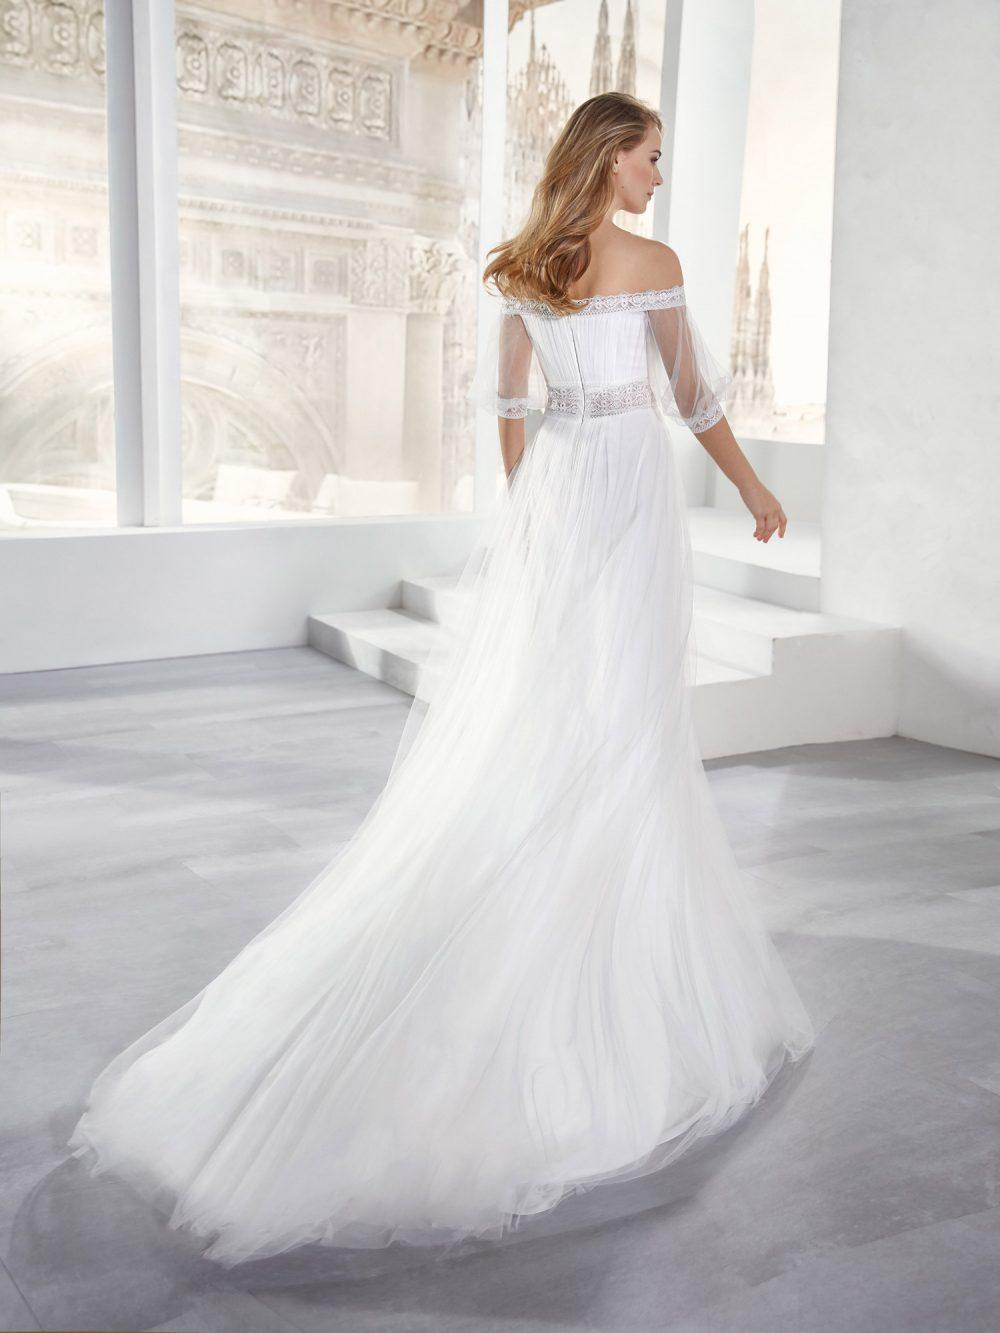 Mariages: abito da sposa Jolies 2021 a Vicenza, Verona, Padova, Veneto JO12185